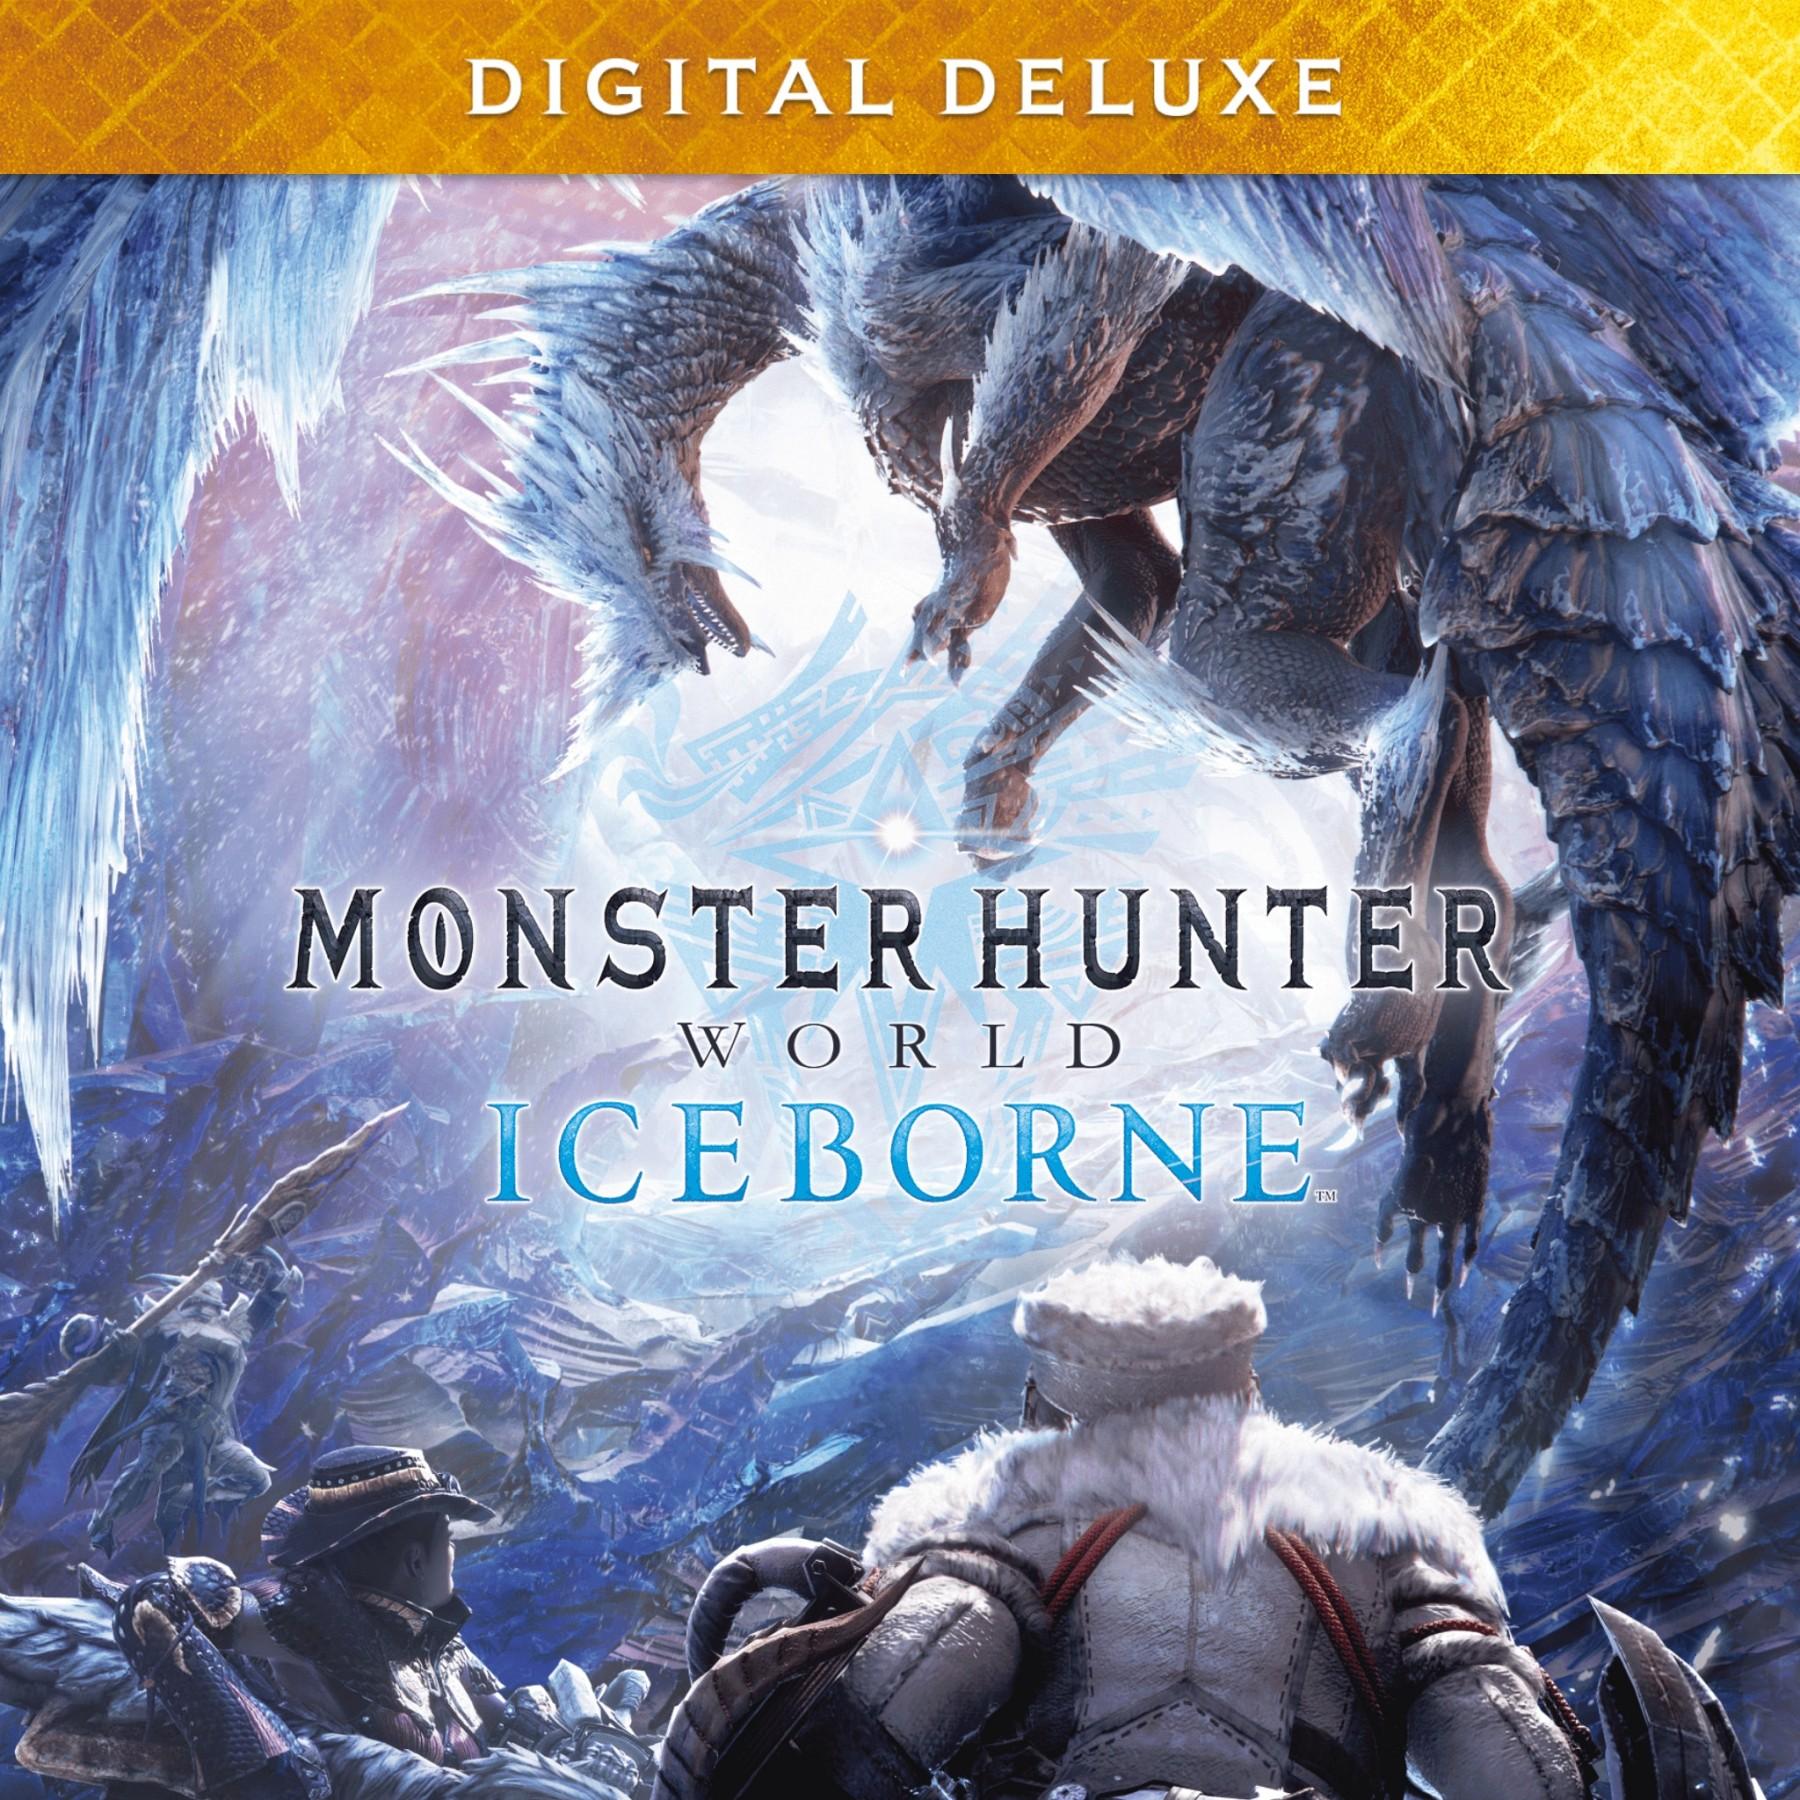 Прокат Monster Hunter World: Iceborne Digital Deluxe от 7 дней PS4